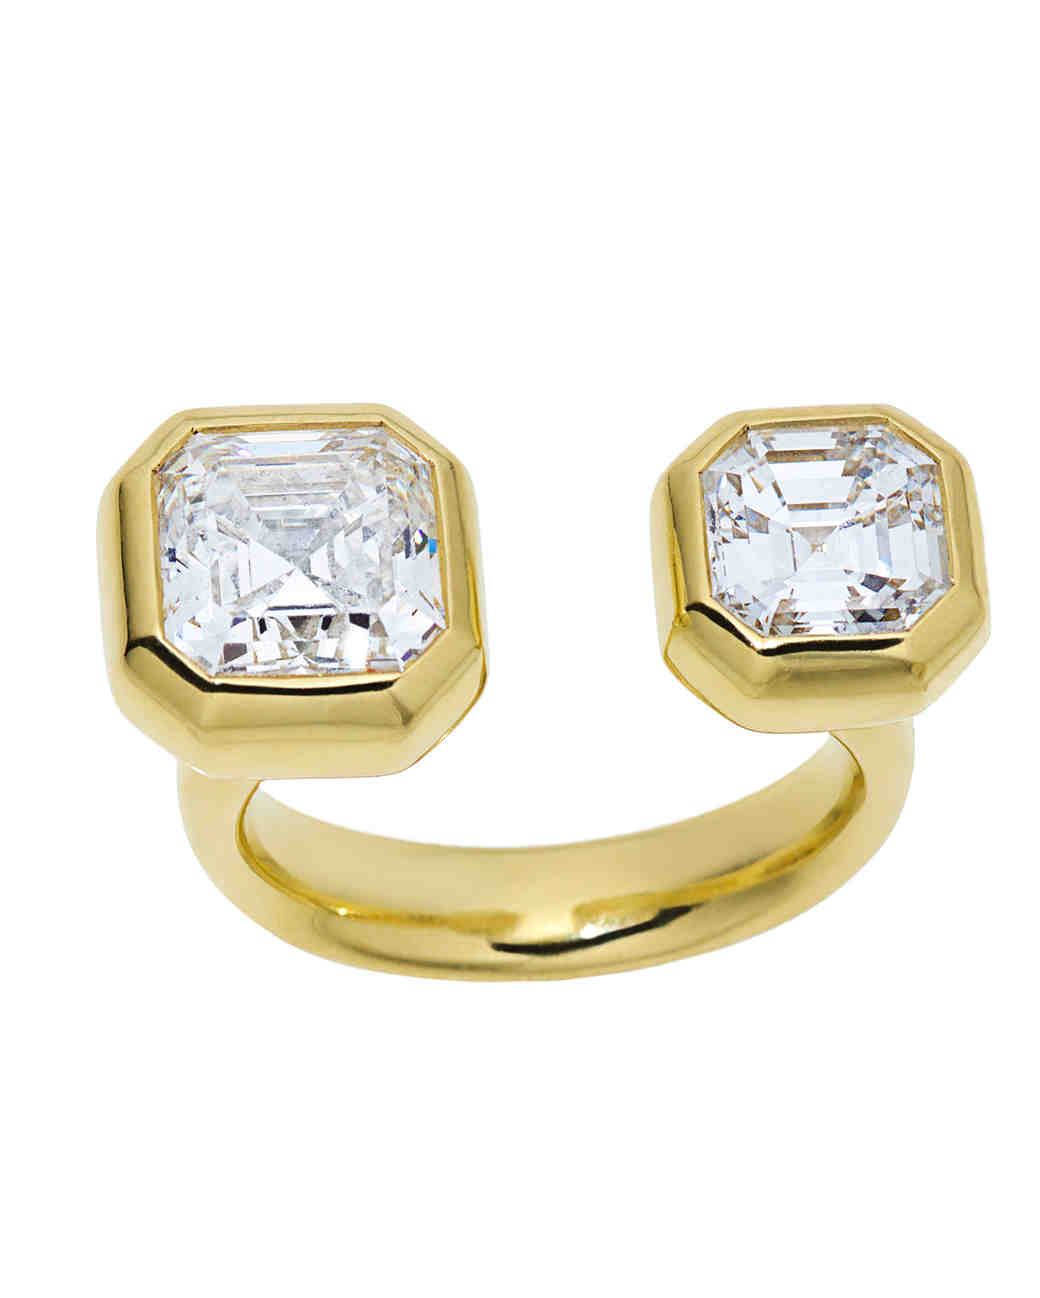 engagement-ring-designers-jemma-wynne-ring-0715.jpg